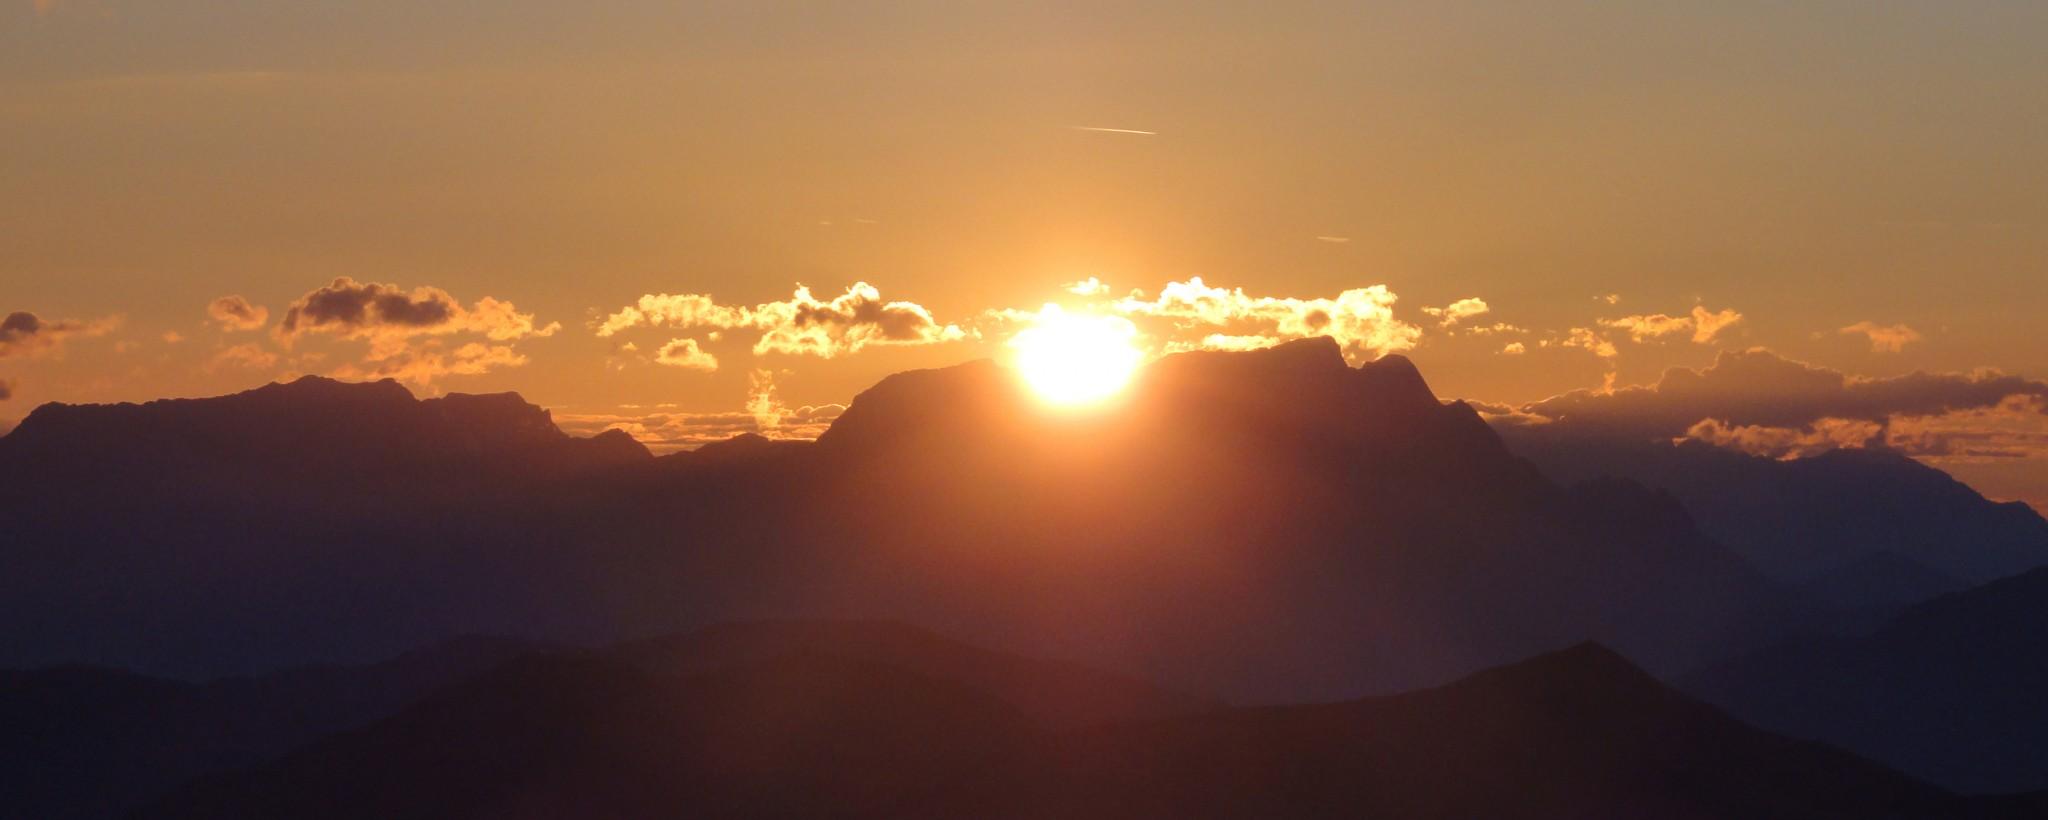 Arnoweg: Sonnenaufgang am Gaisstein